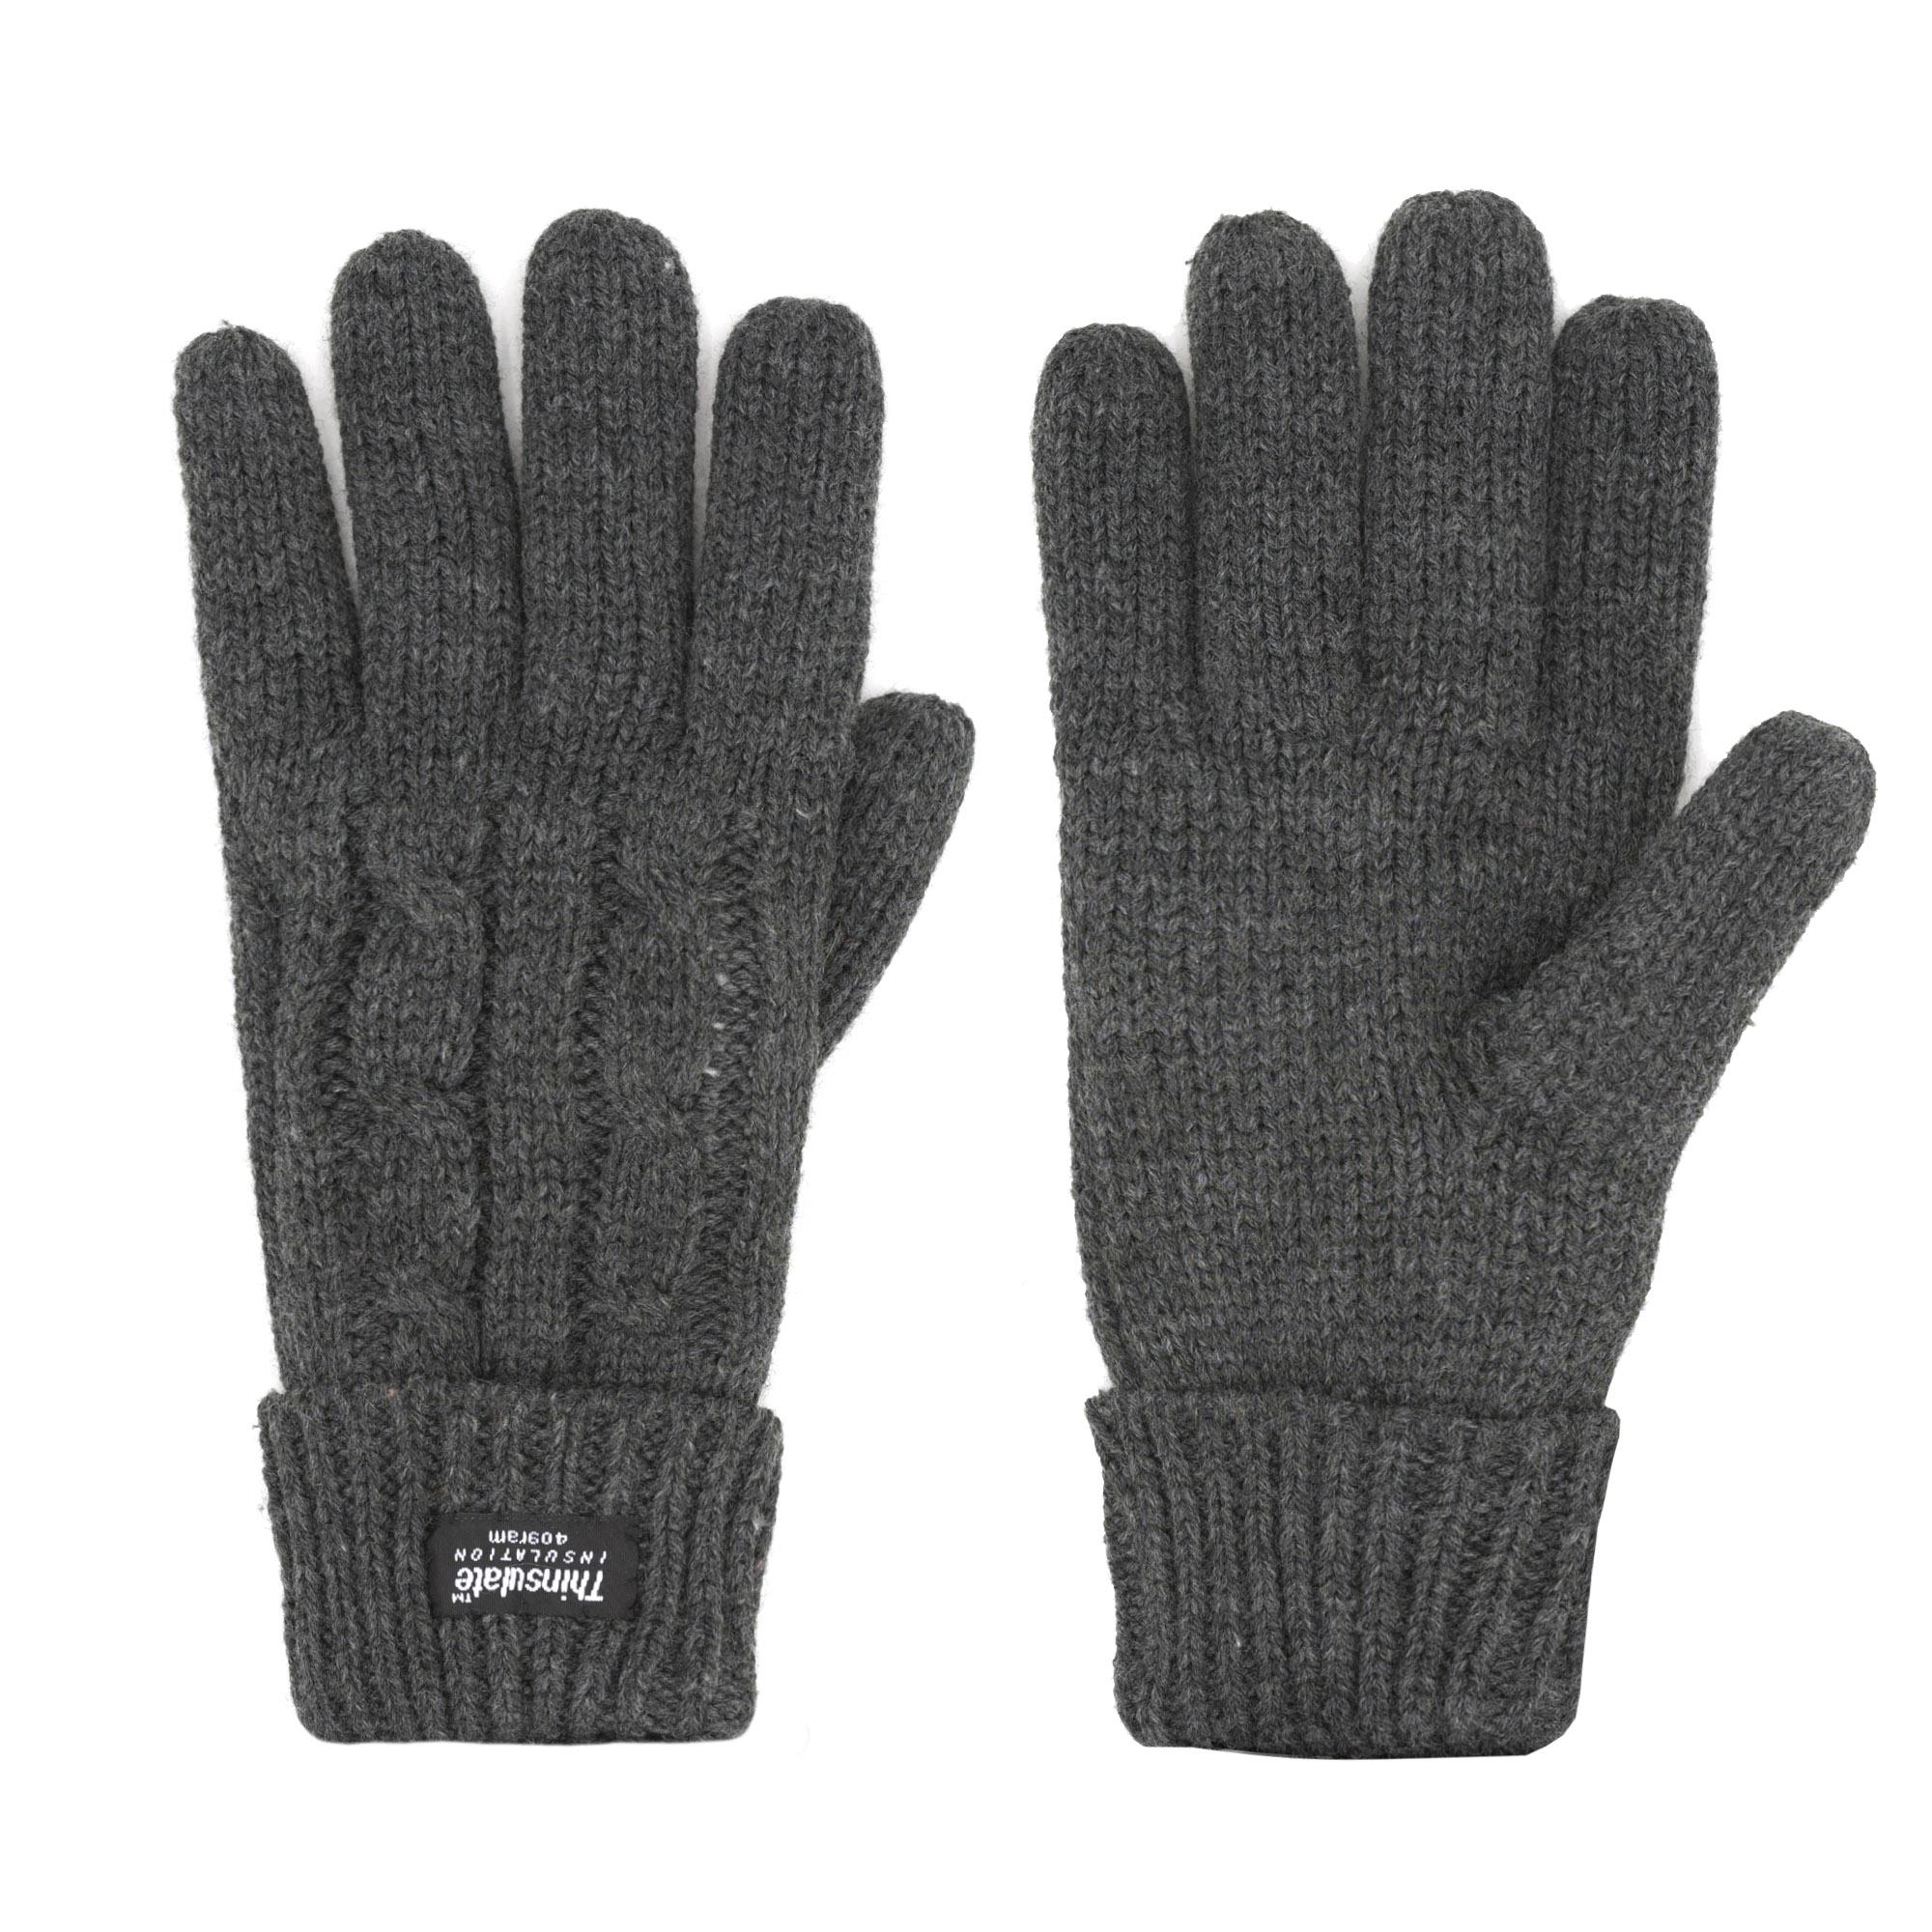 دستکش بافتنی زنانه آردن کد D03 B